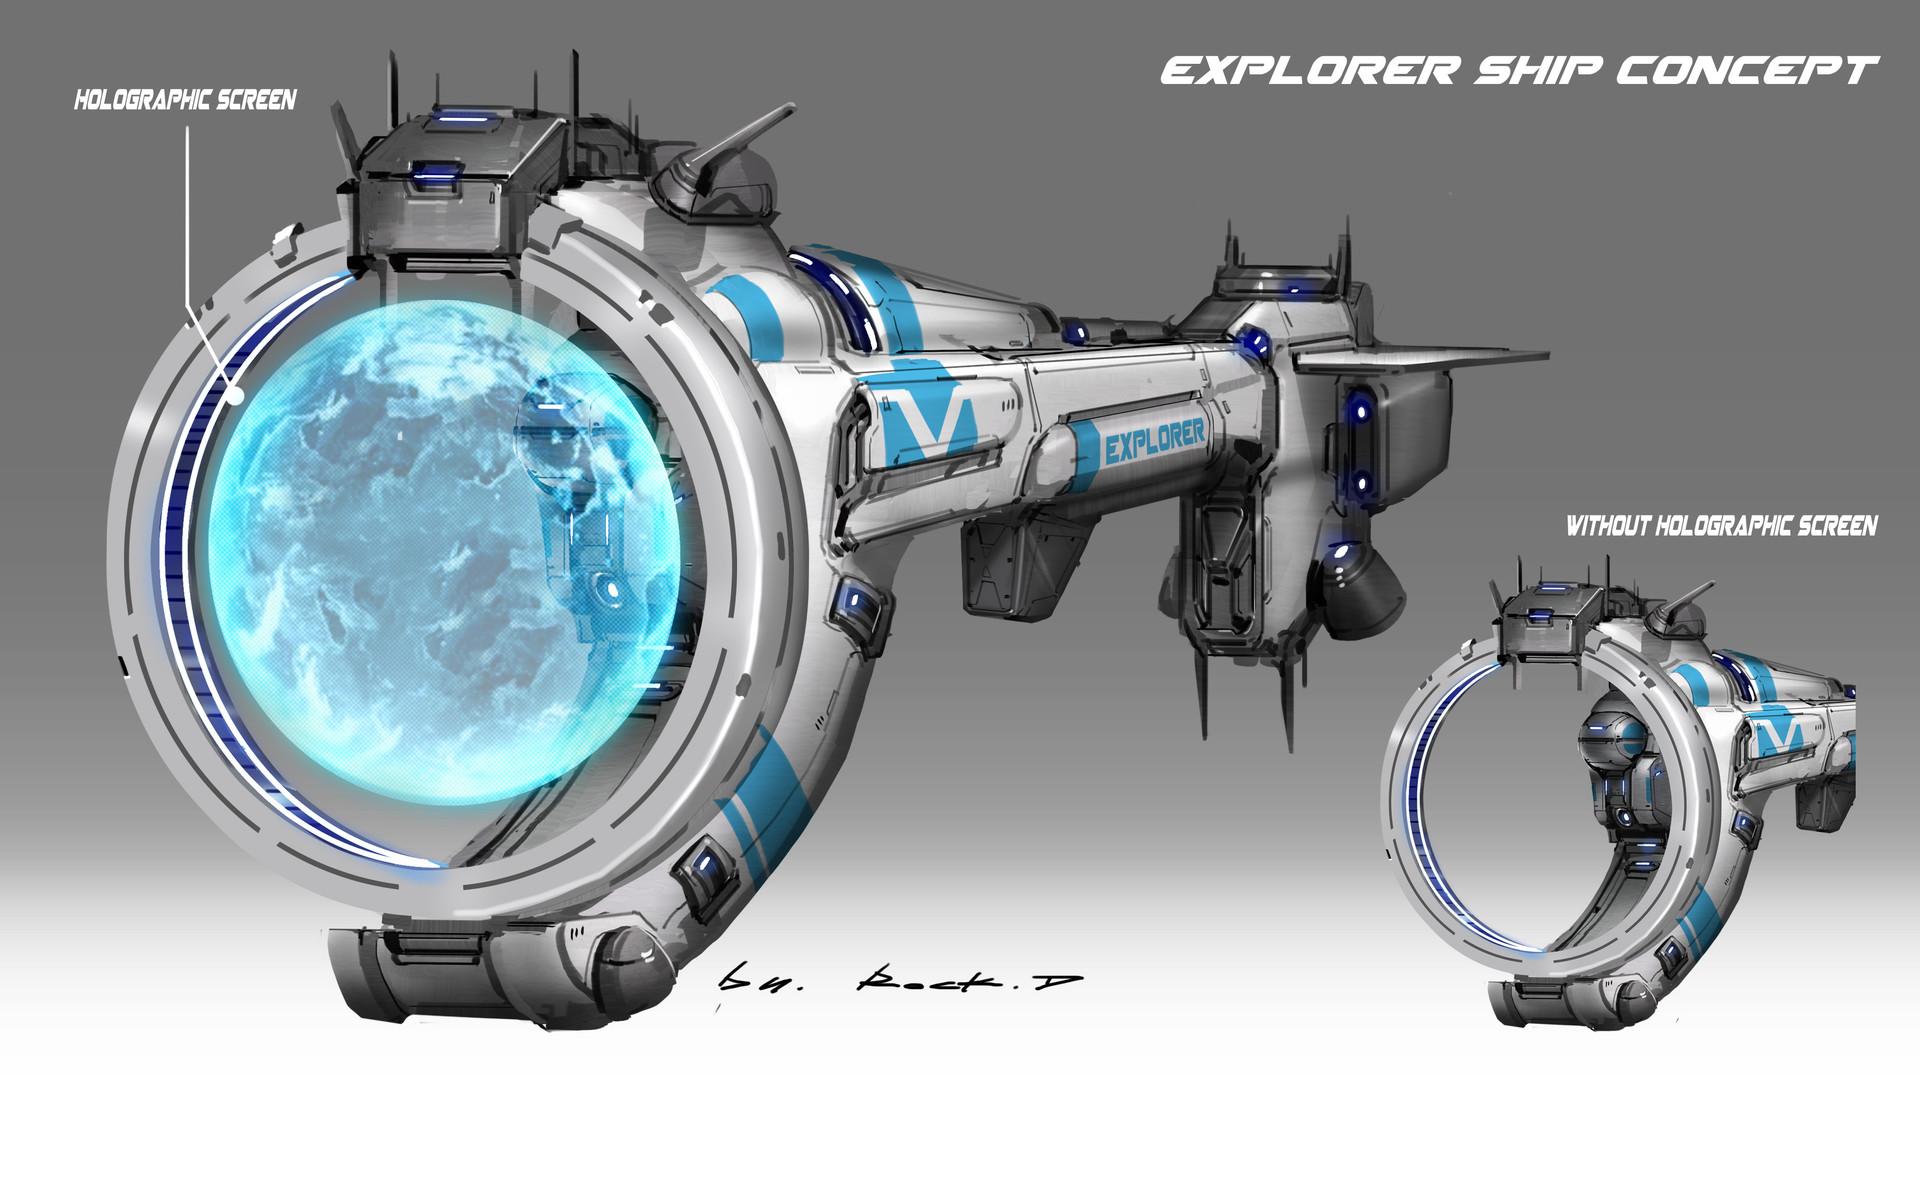 Rock d explorer ship